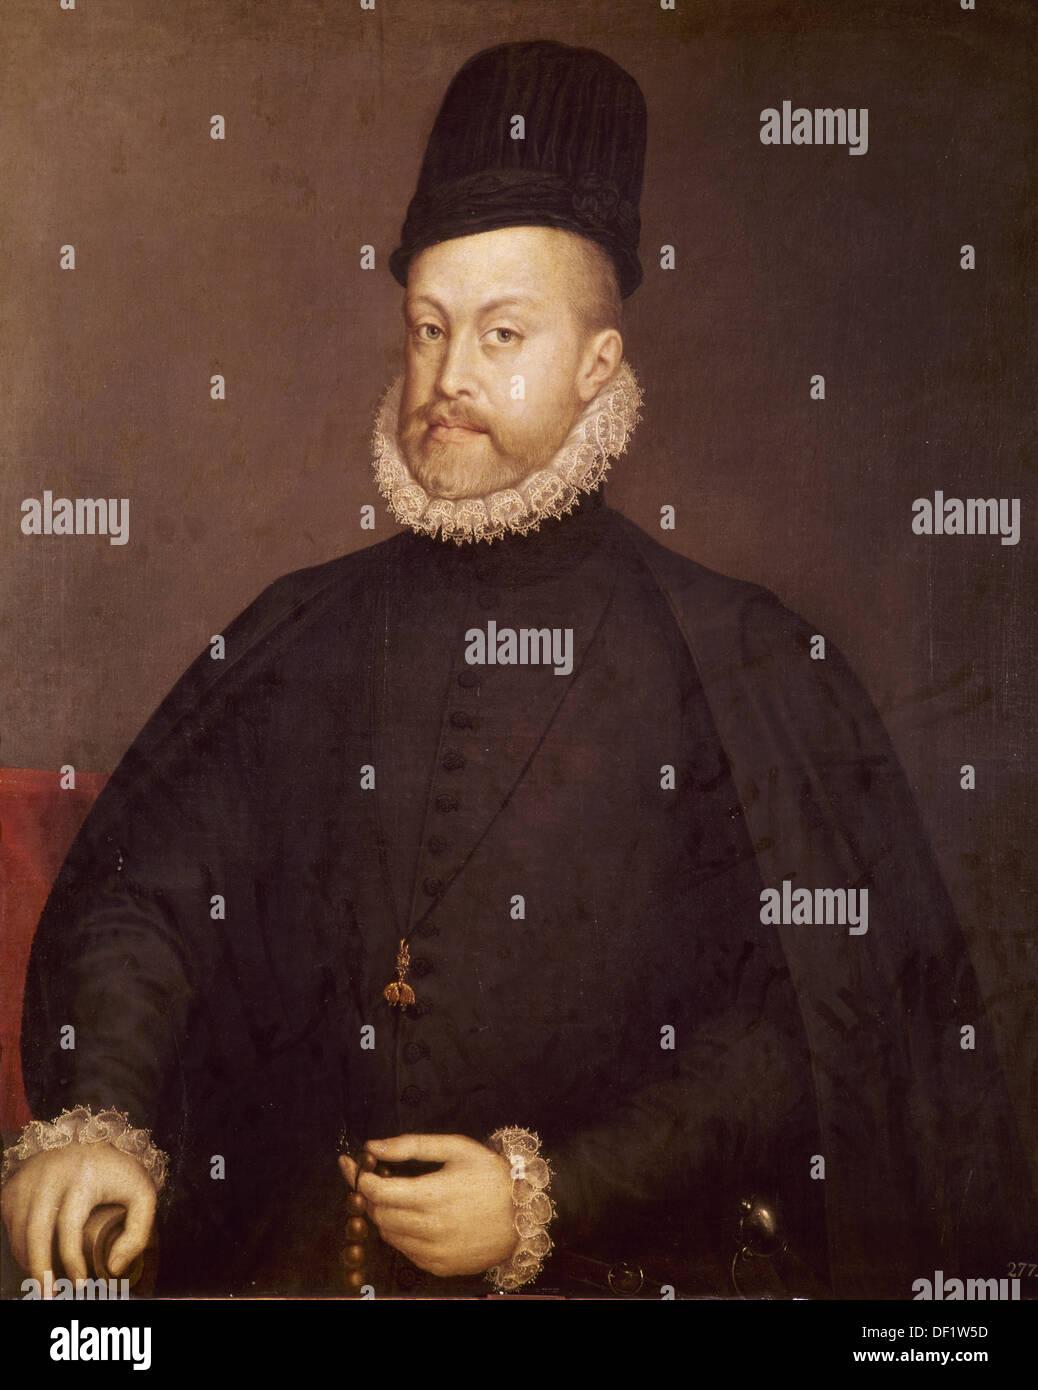 Philip II of Spain (1527-1598). Portrait by Sanchez Coello. Museum of Prado. Madrid. Spain. - Stock Image